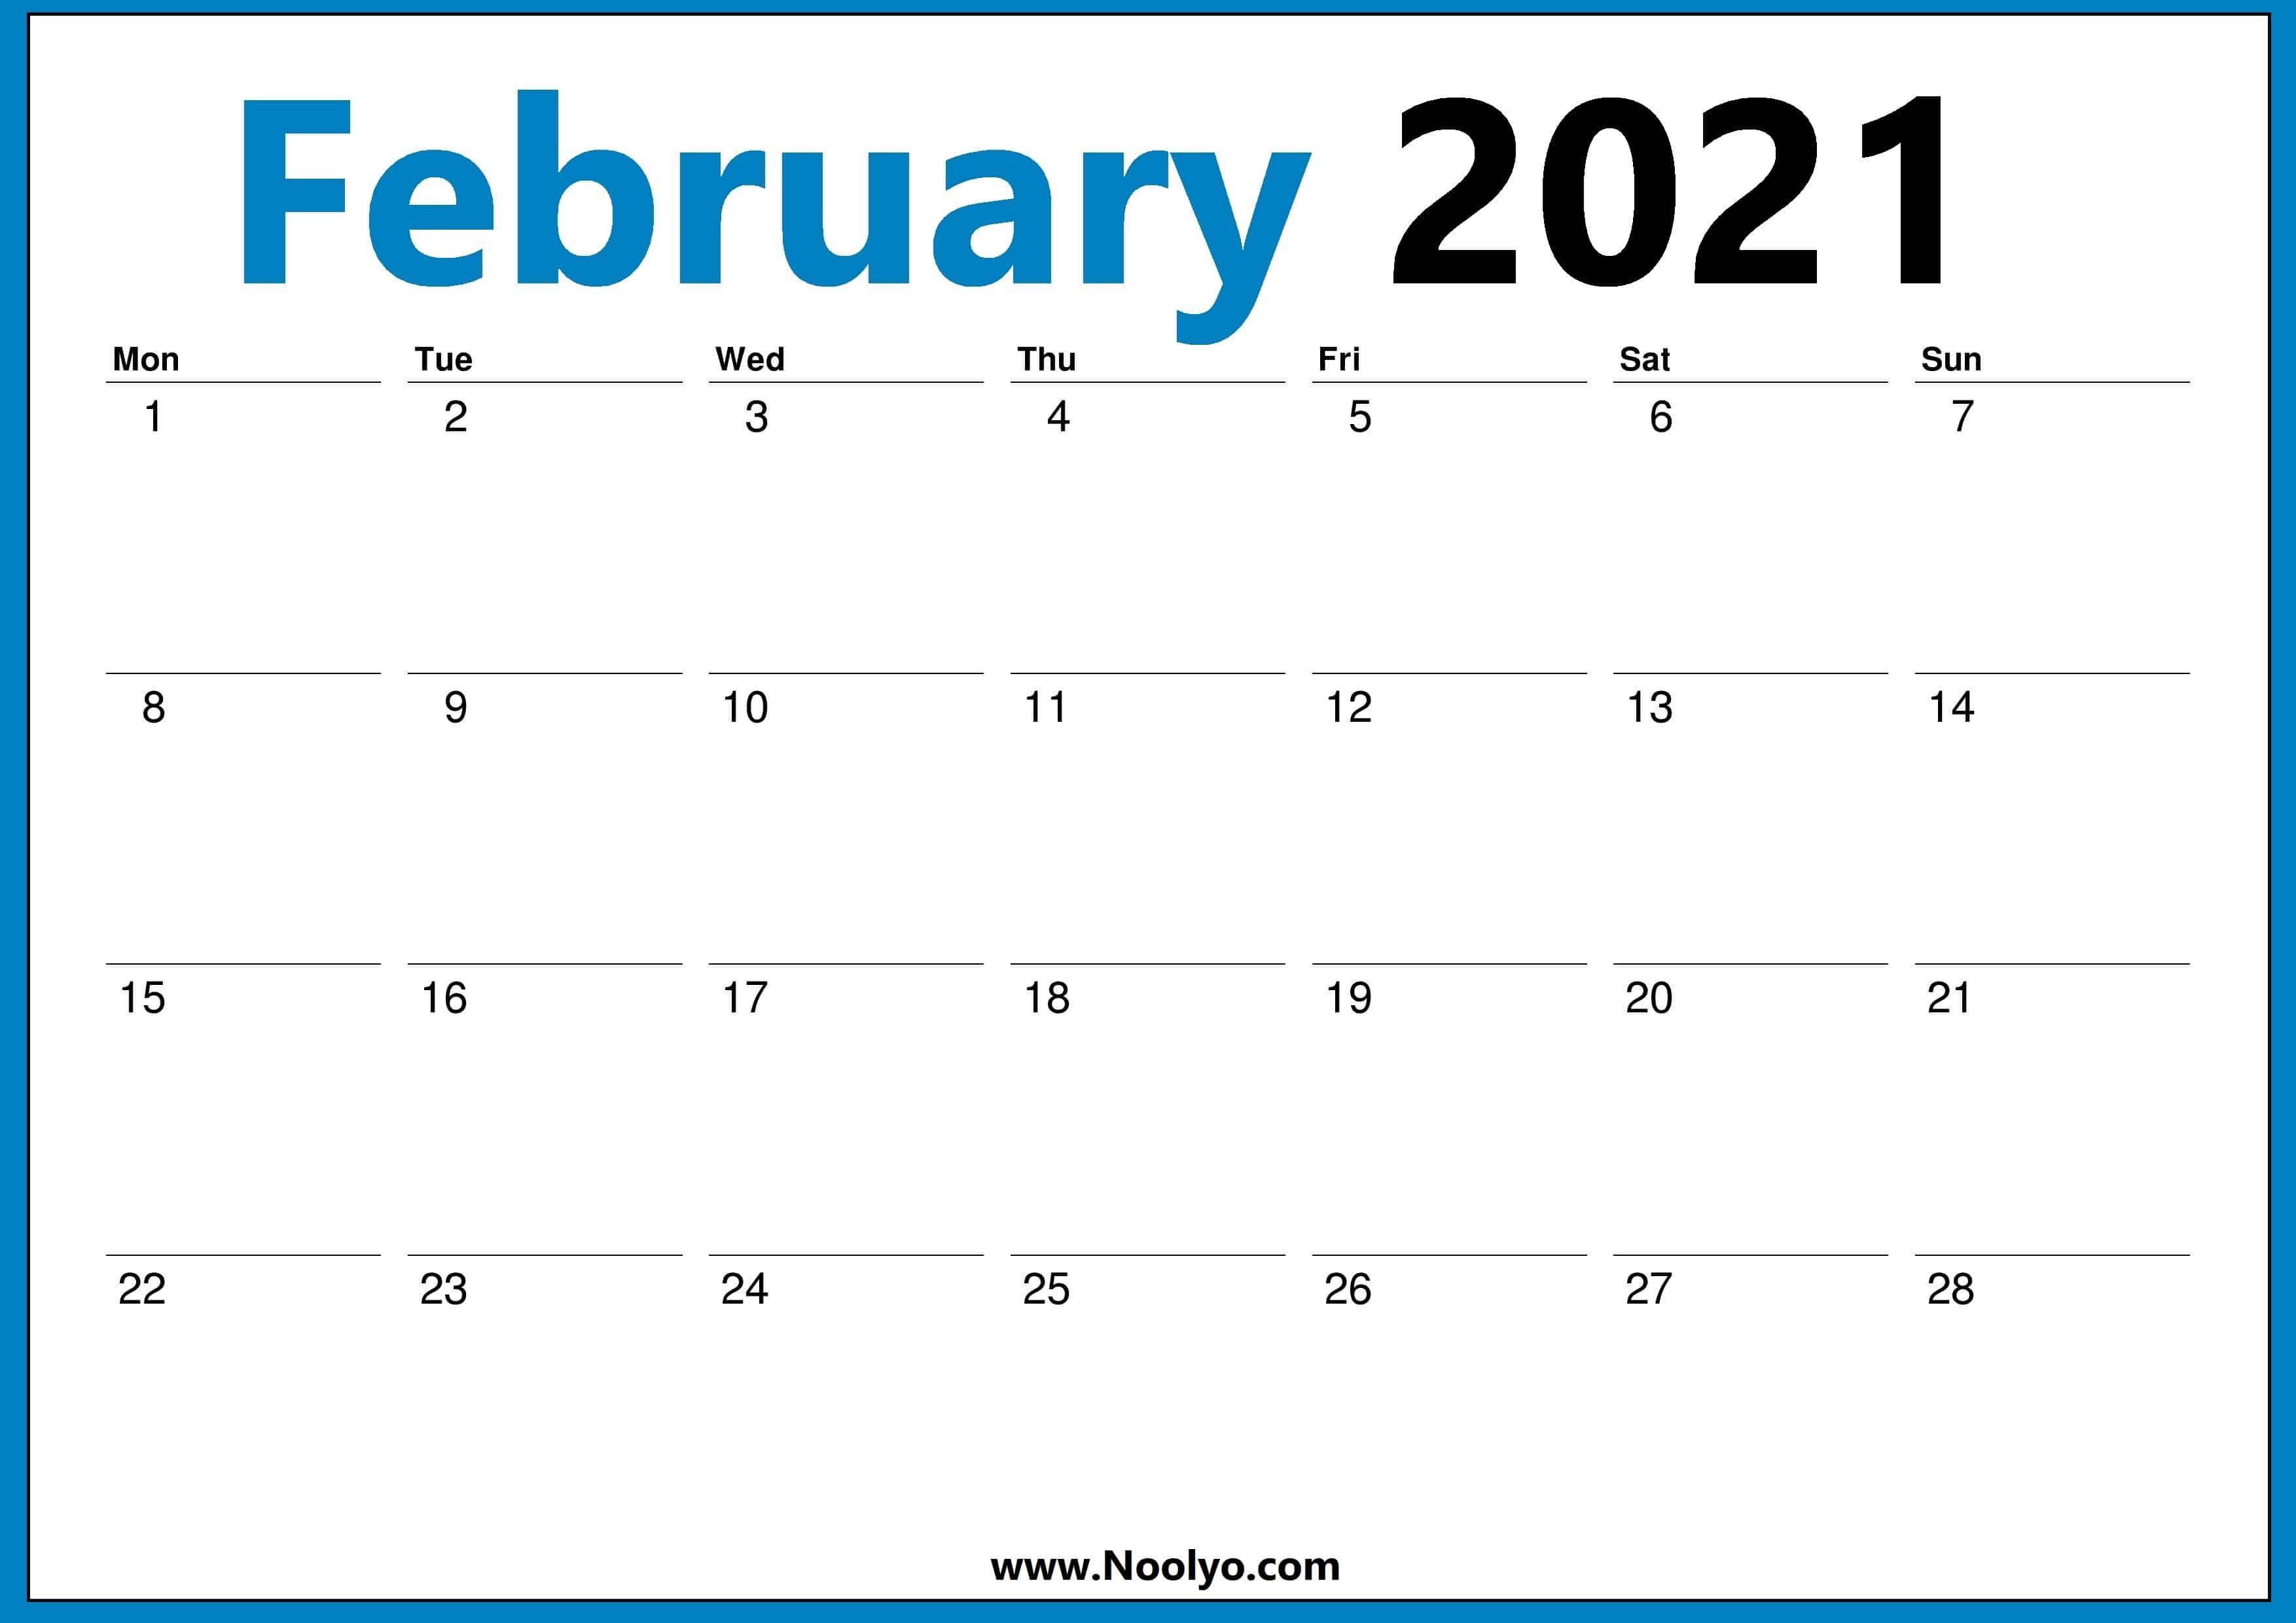 Monthly February 2021 Calendar - Blank Printable Template